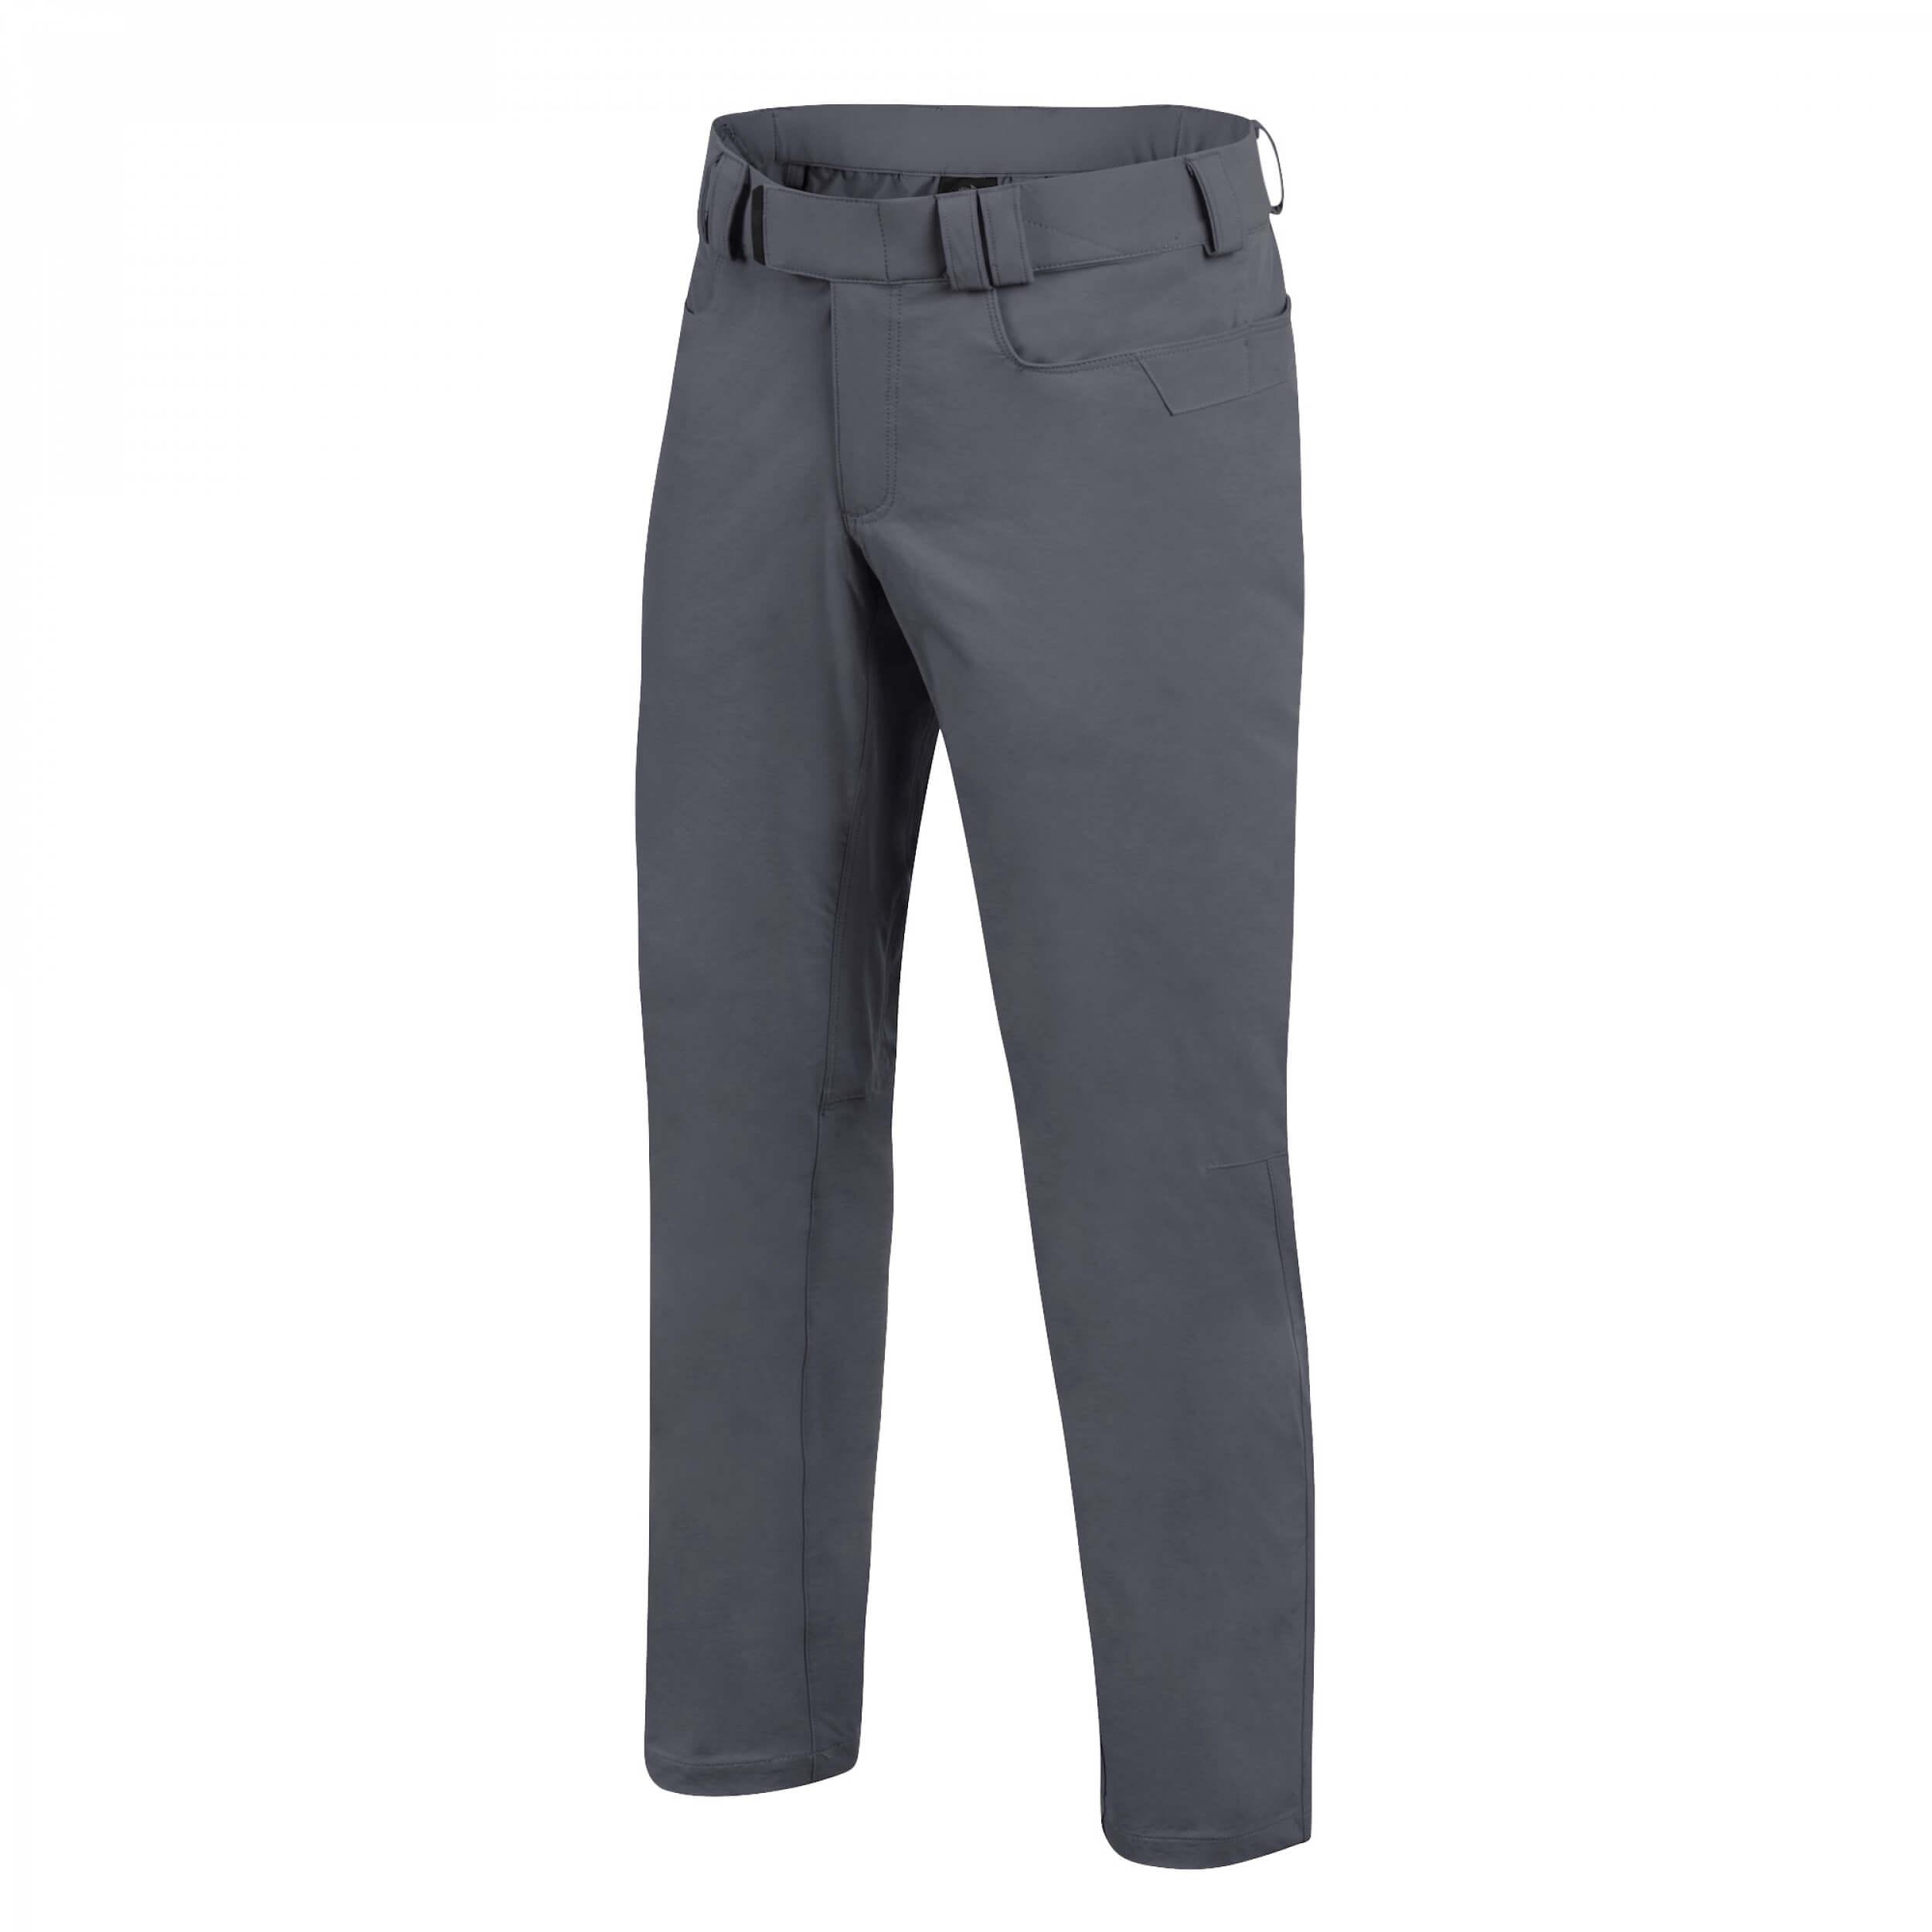 Helikon-Tex Covert Tactical Pants -VersaStretch- Shadow Grey